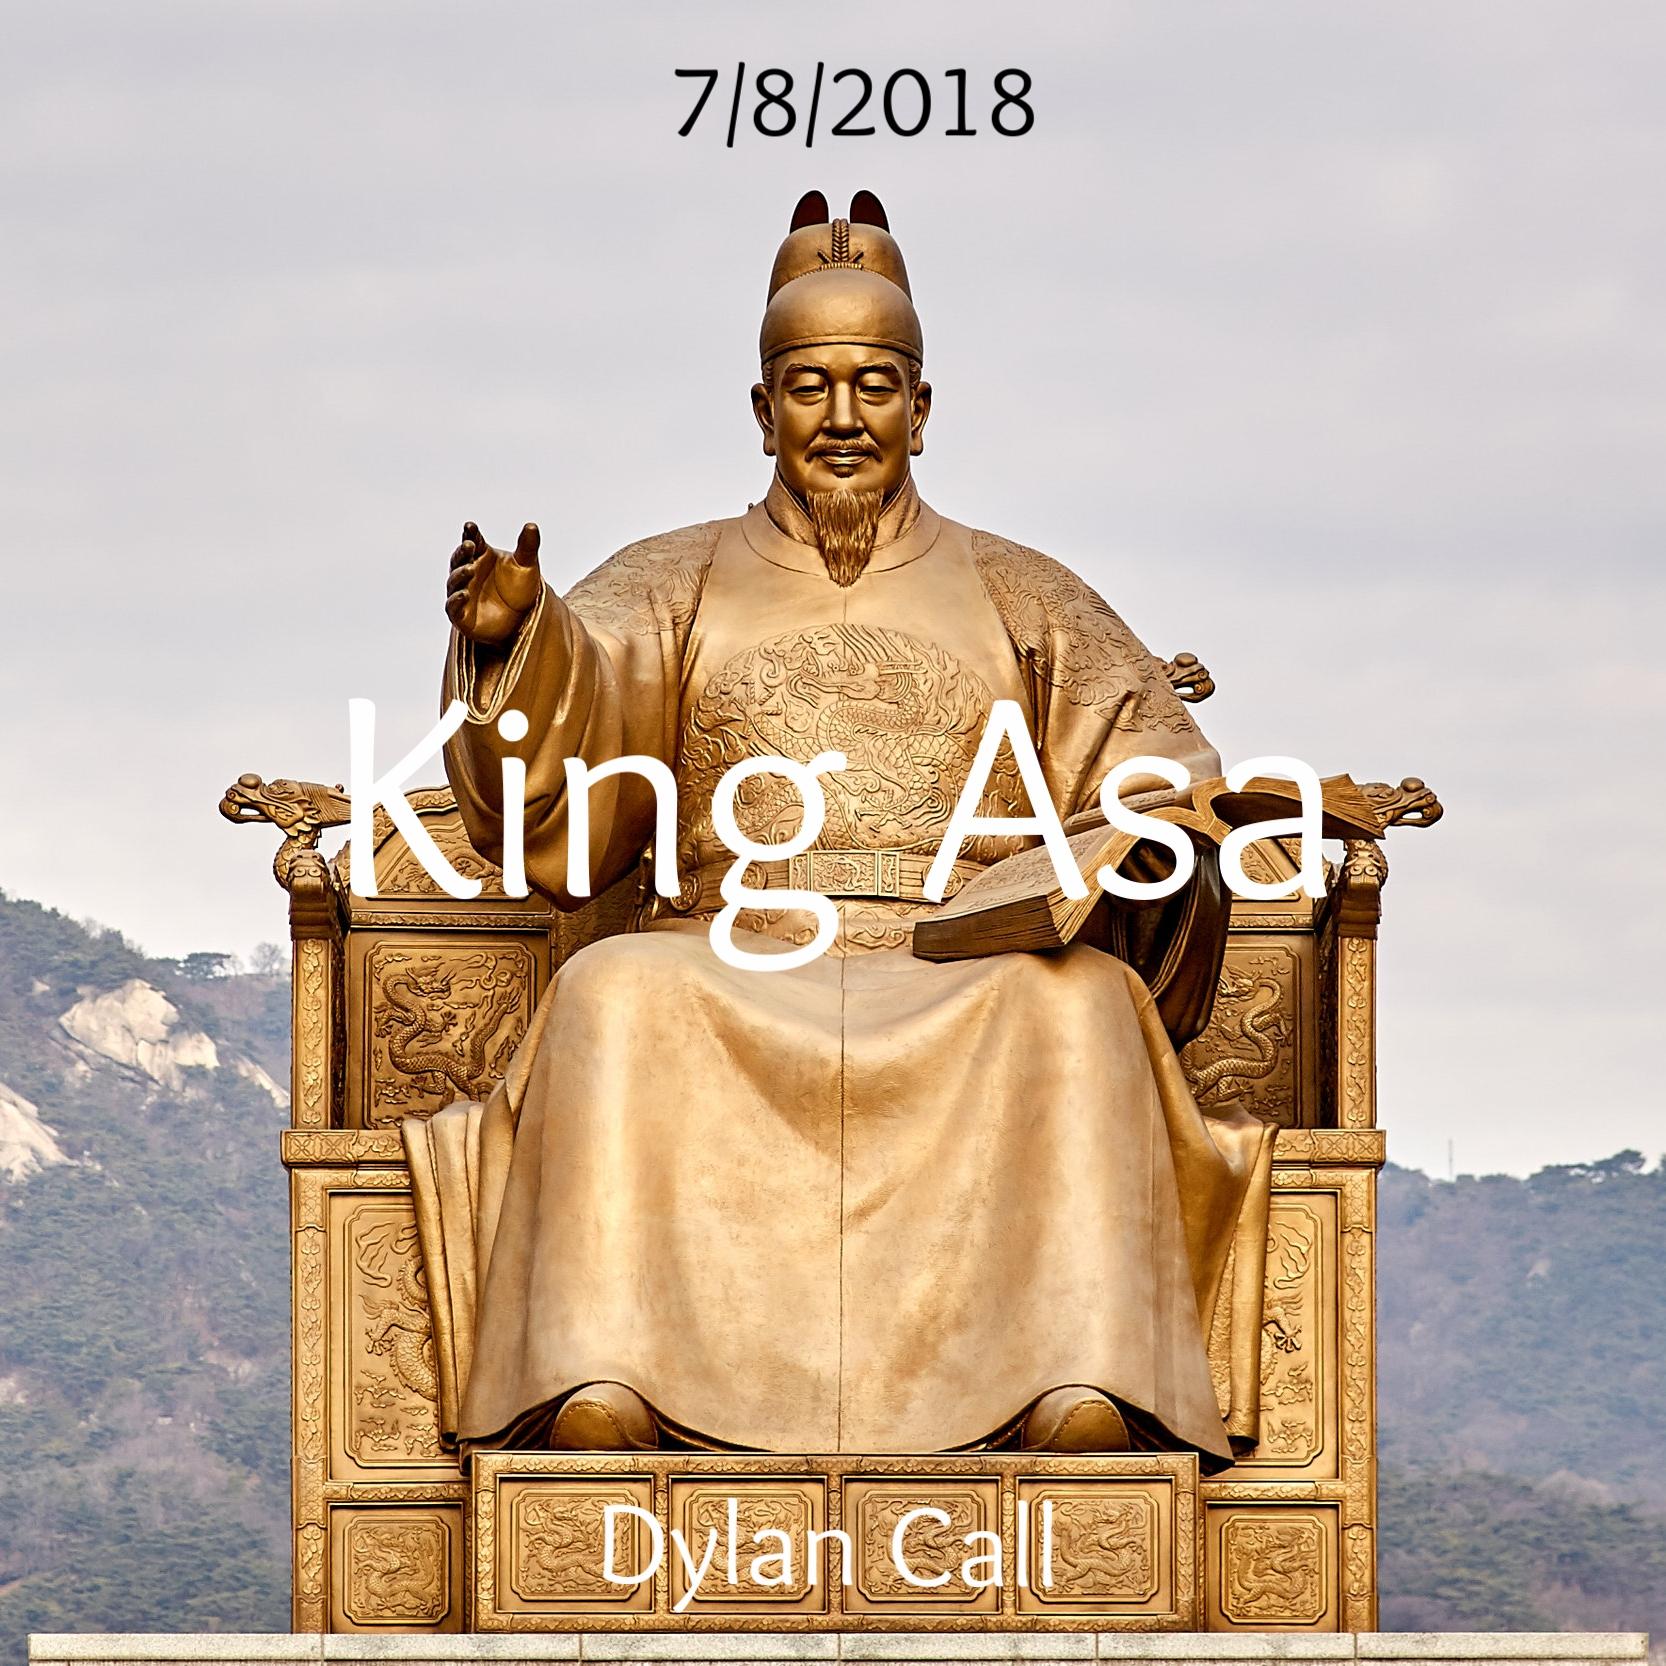 King Asa